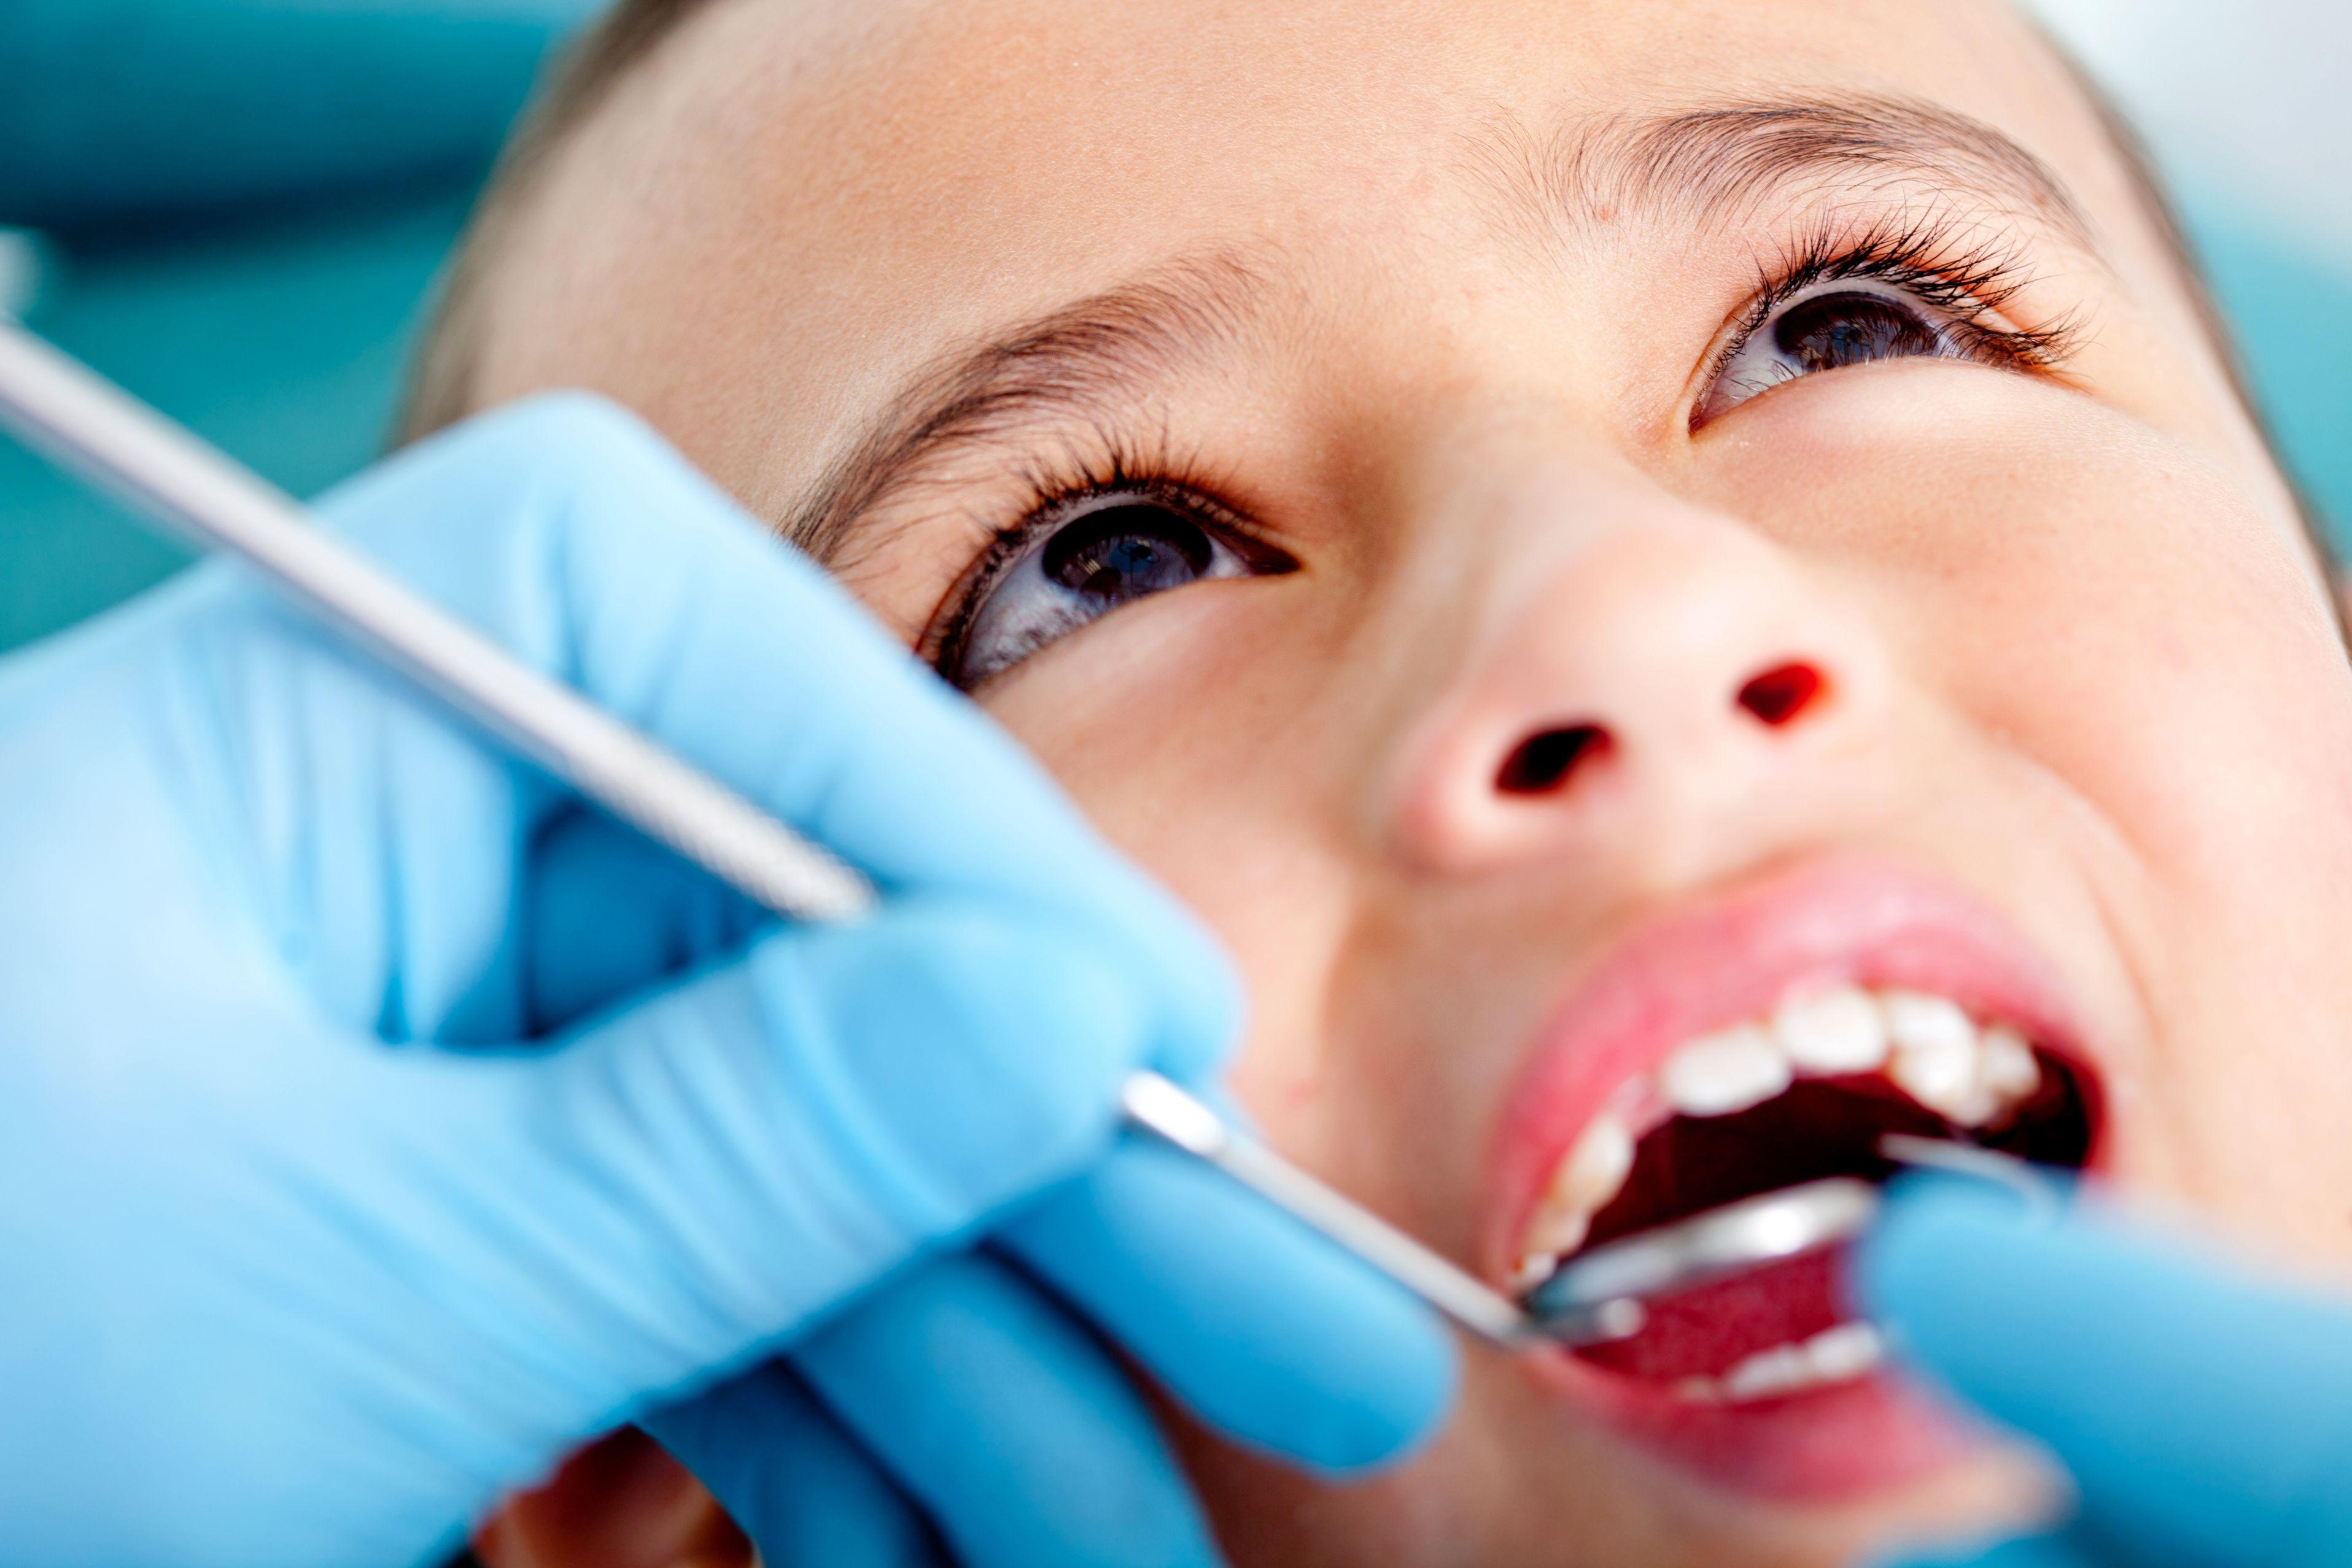 Tetraciclina Fibra Periodontal (Odontológico)